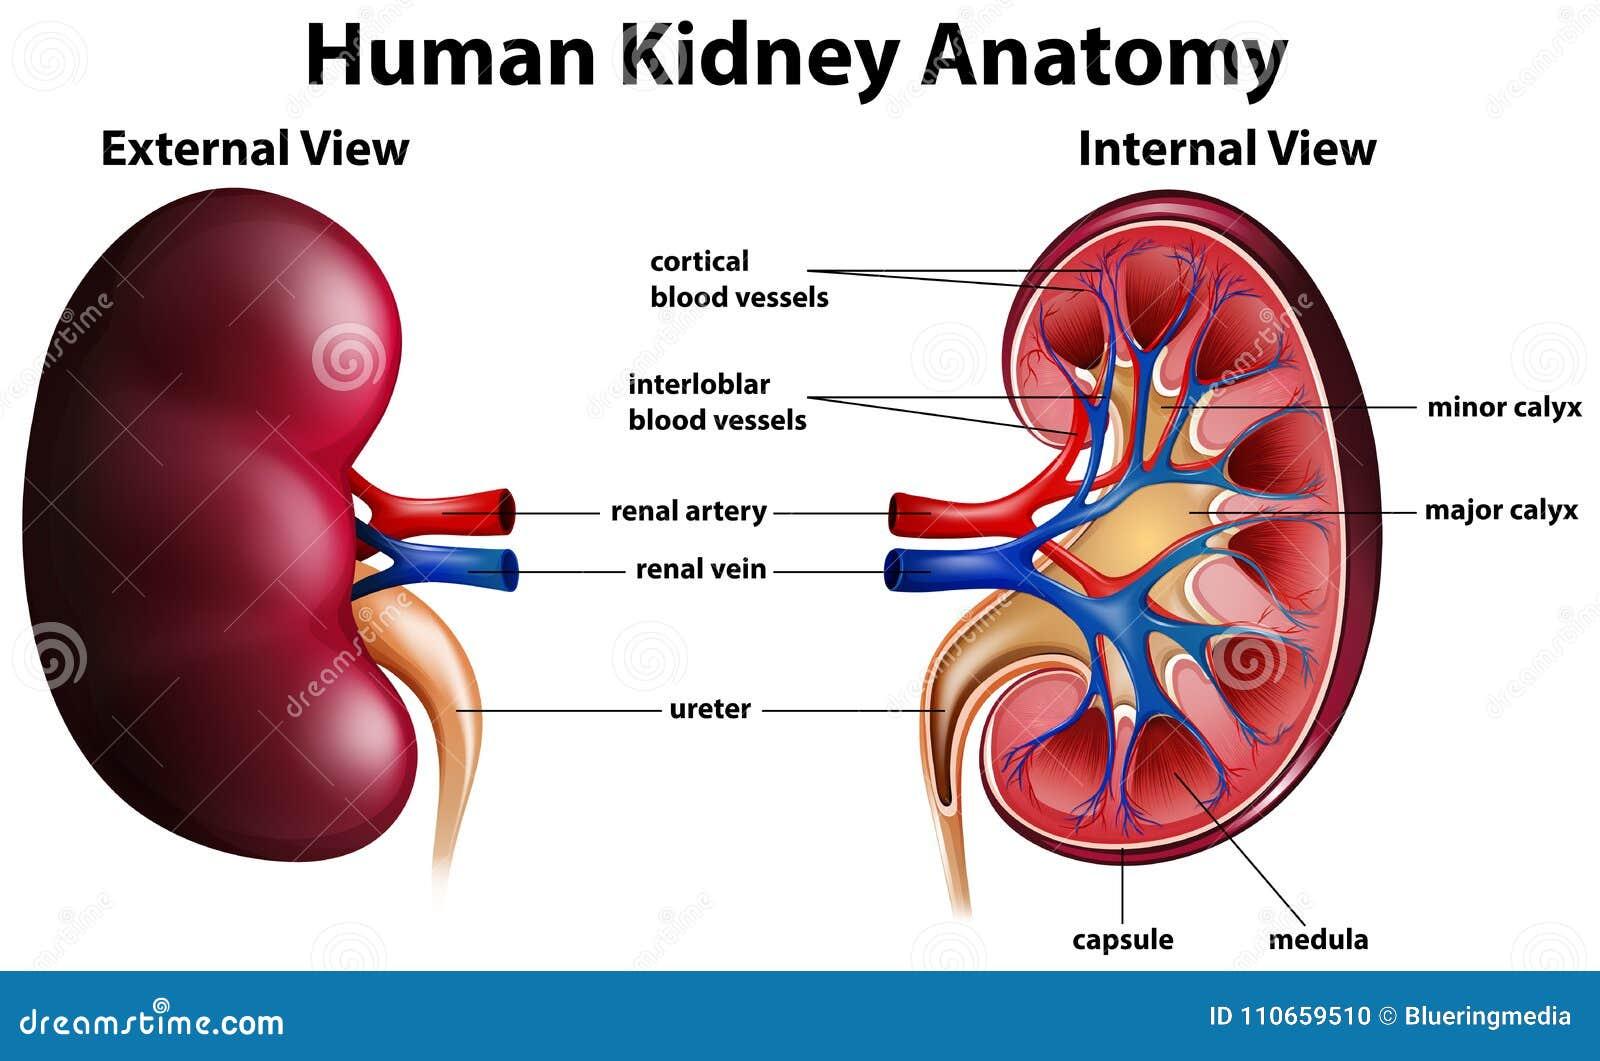 Diagram Showing Human Kidney Anatomy Stock Vector - Illustration of ...